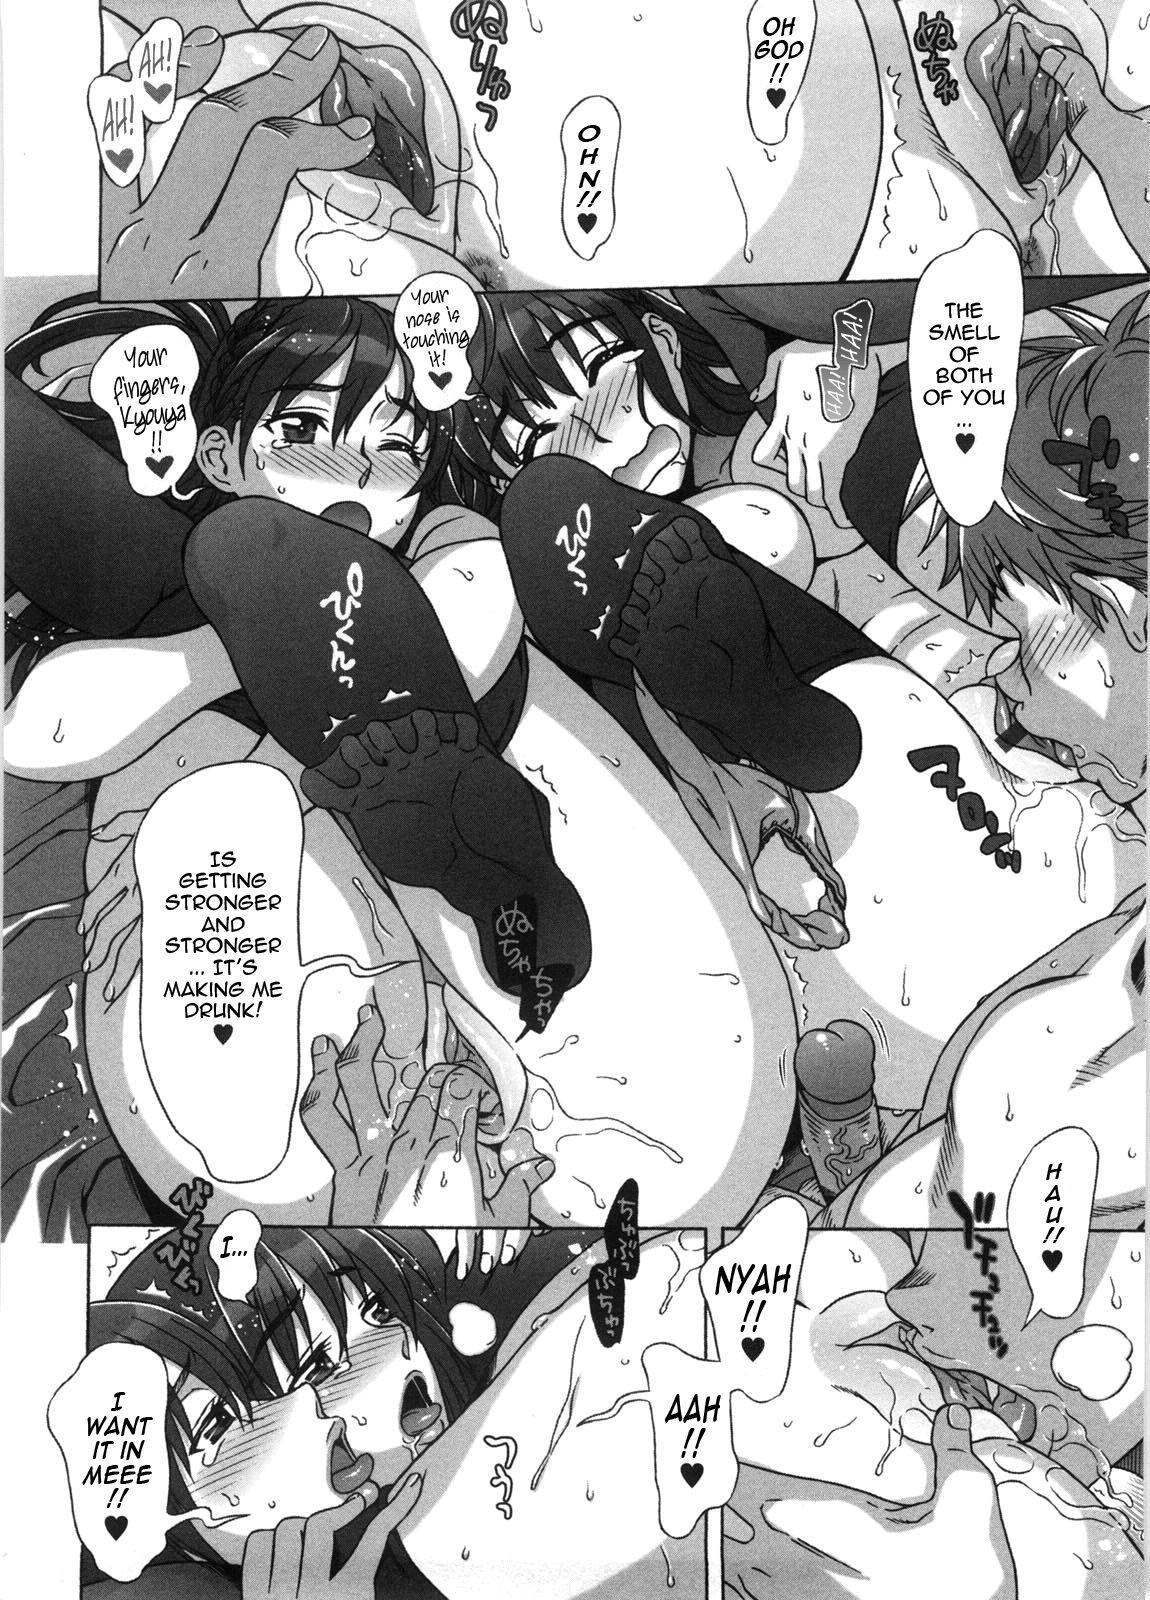 [Hanzaki Jirou] Ama Ero - Sweet Sugar Baby Ch. 1-7 [English] [Tadanohito] [Decensored] 18